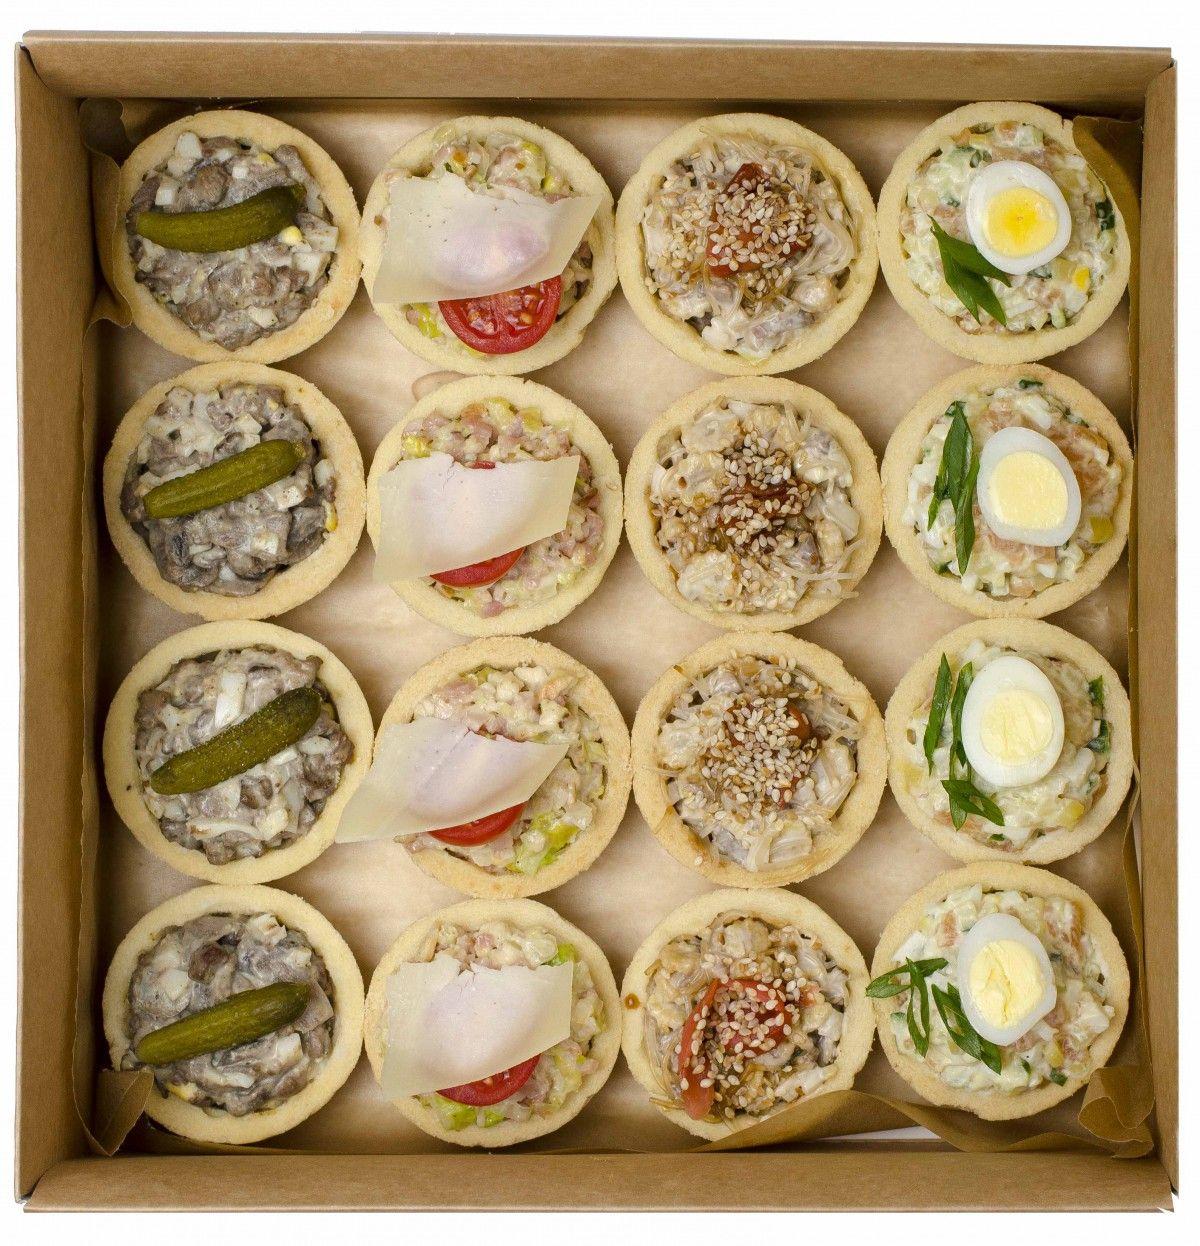 Salad smart box фото 1